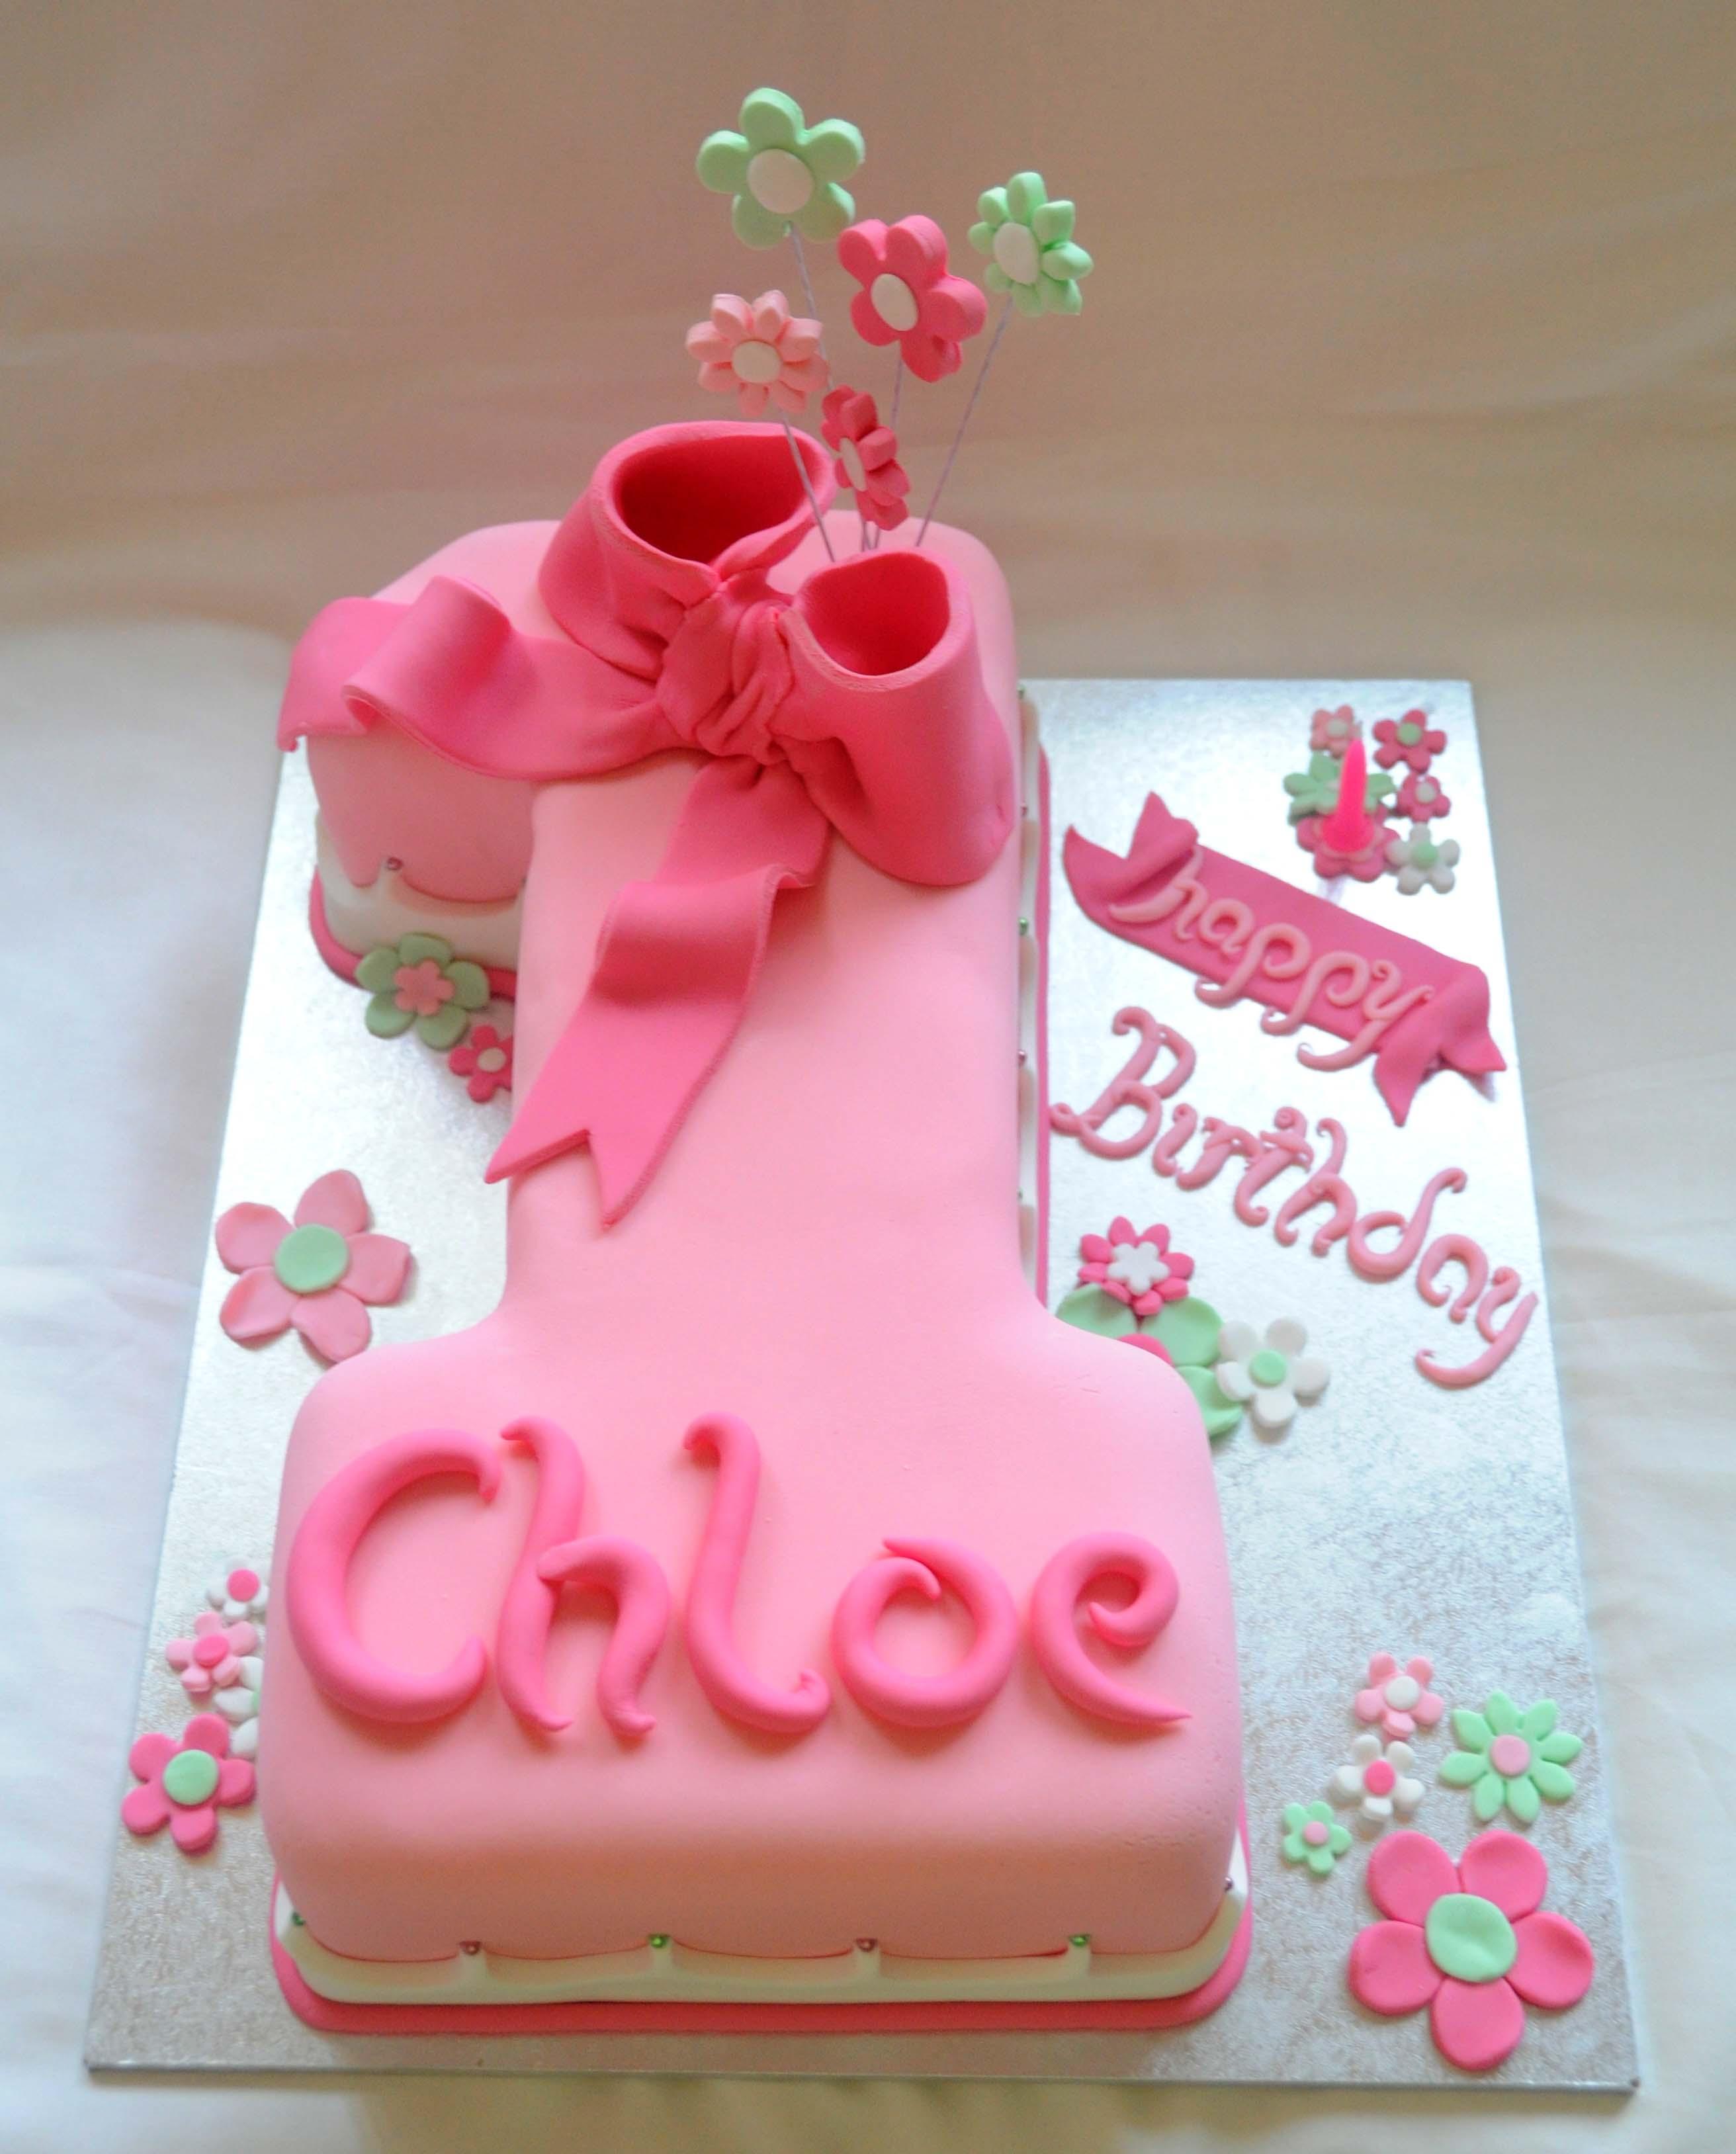 DSC_0595copy birthday cake ideas sweet 16 4 on birthday cake ideas sweet 16